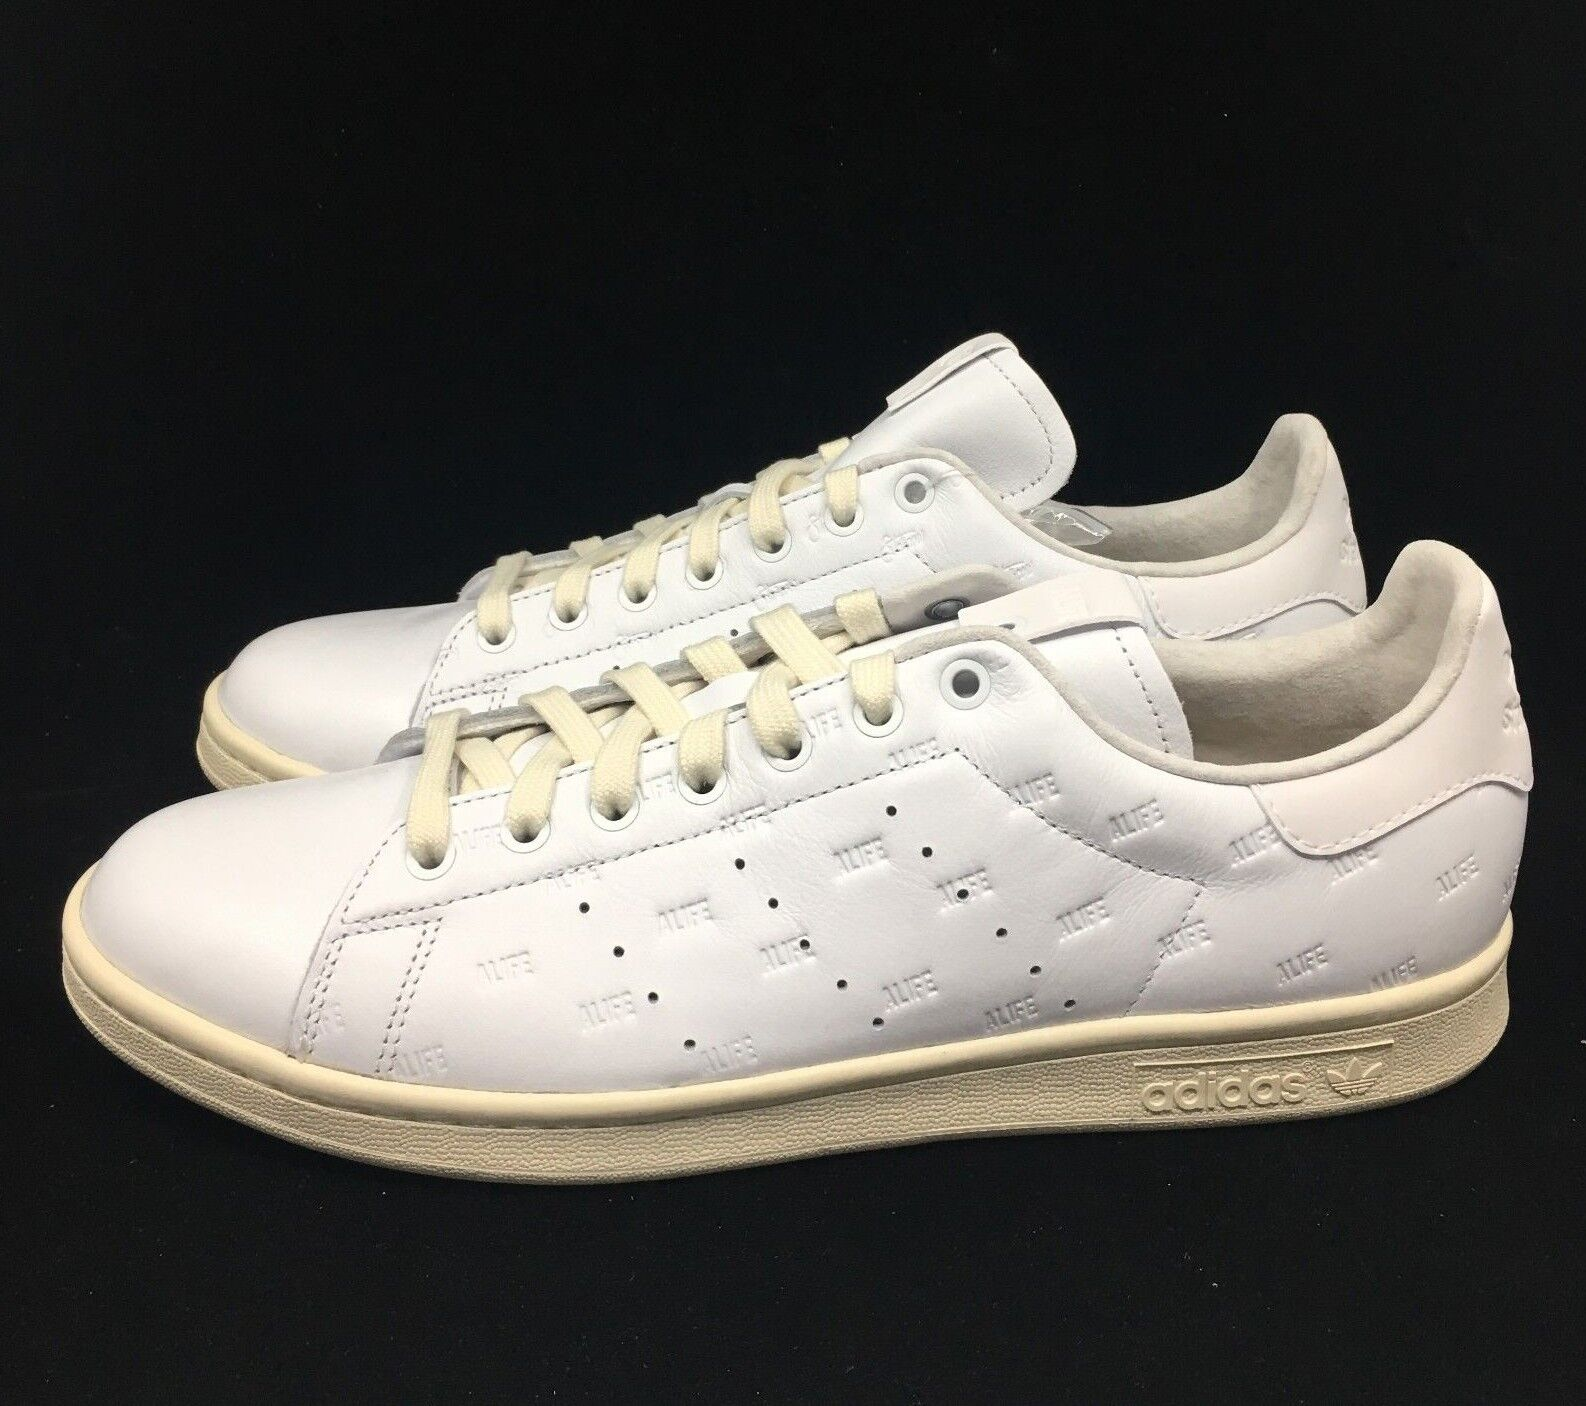 3abf08c5a36 Adidas Stan Smith SE Alife Alife Alife X Starcow Consortium Core ...